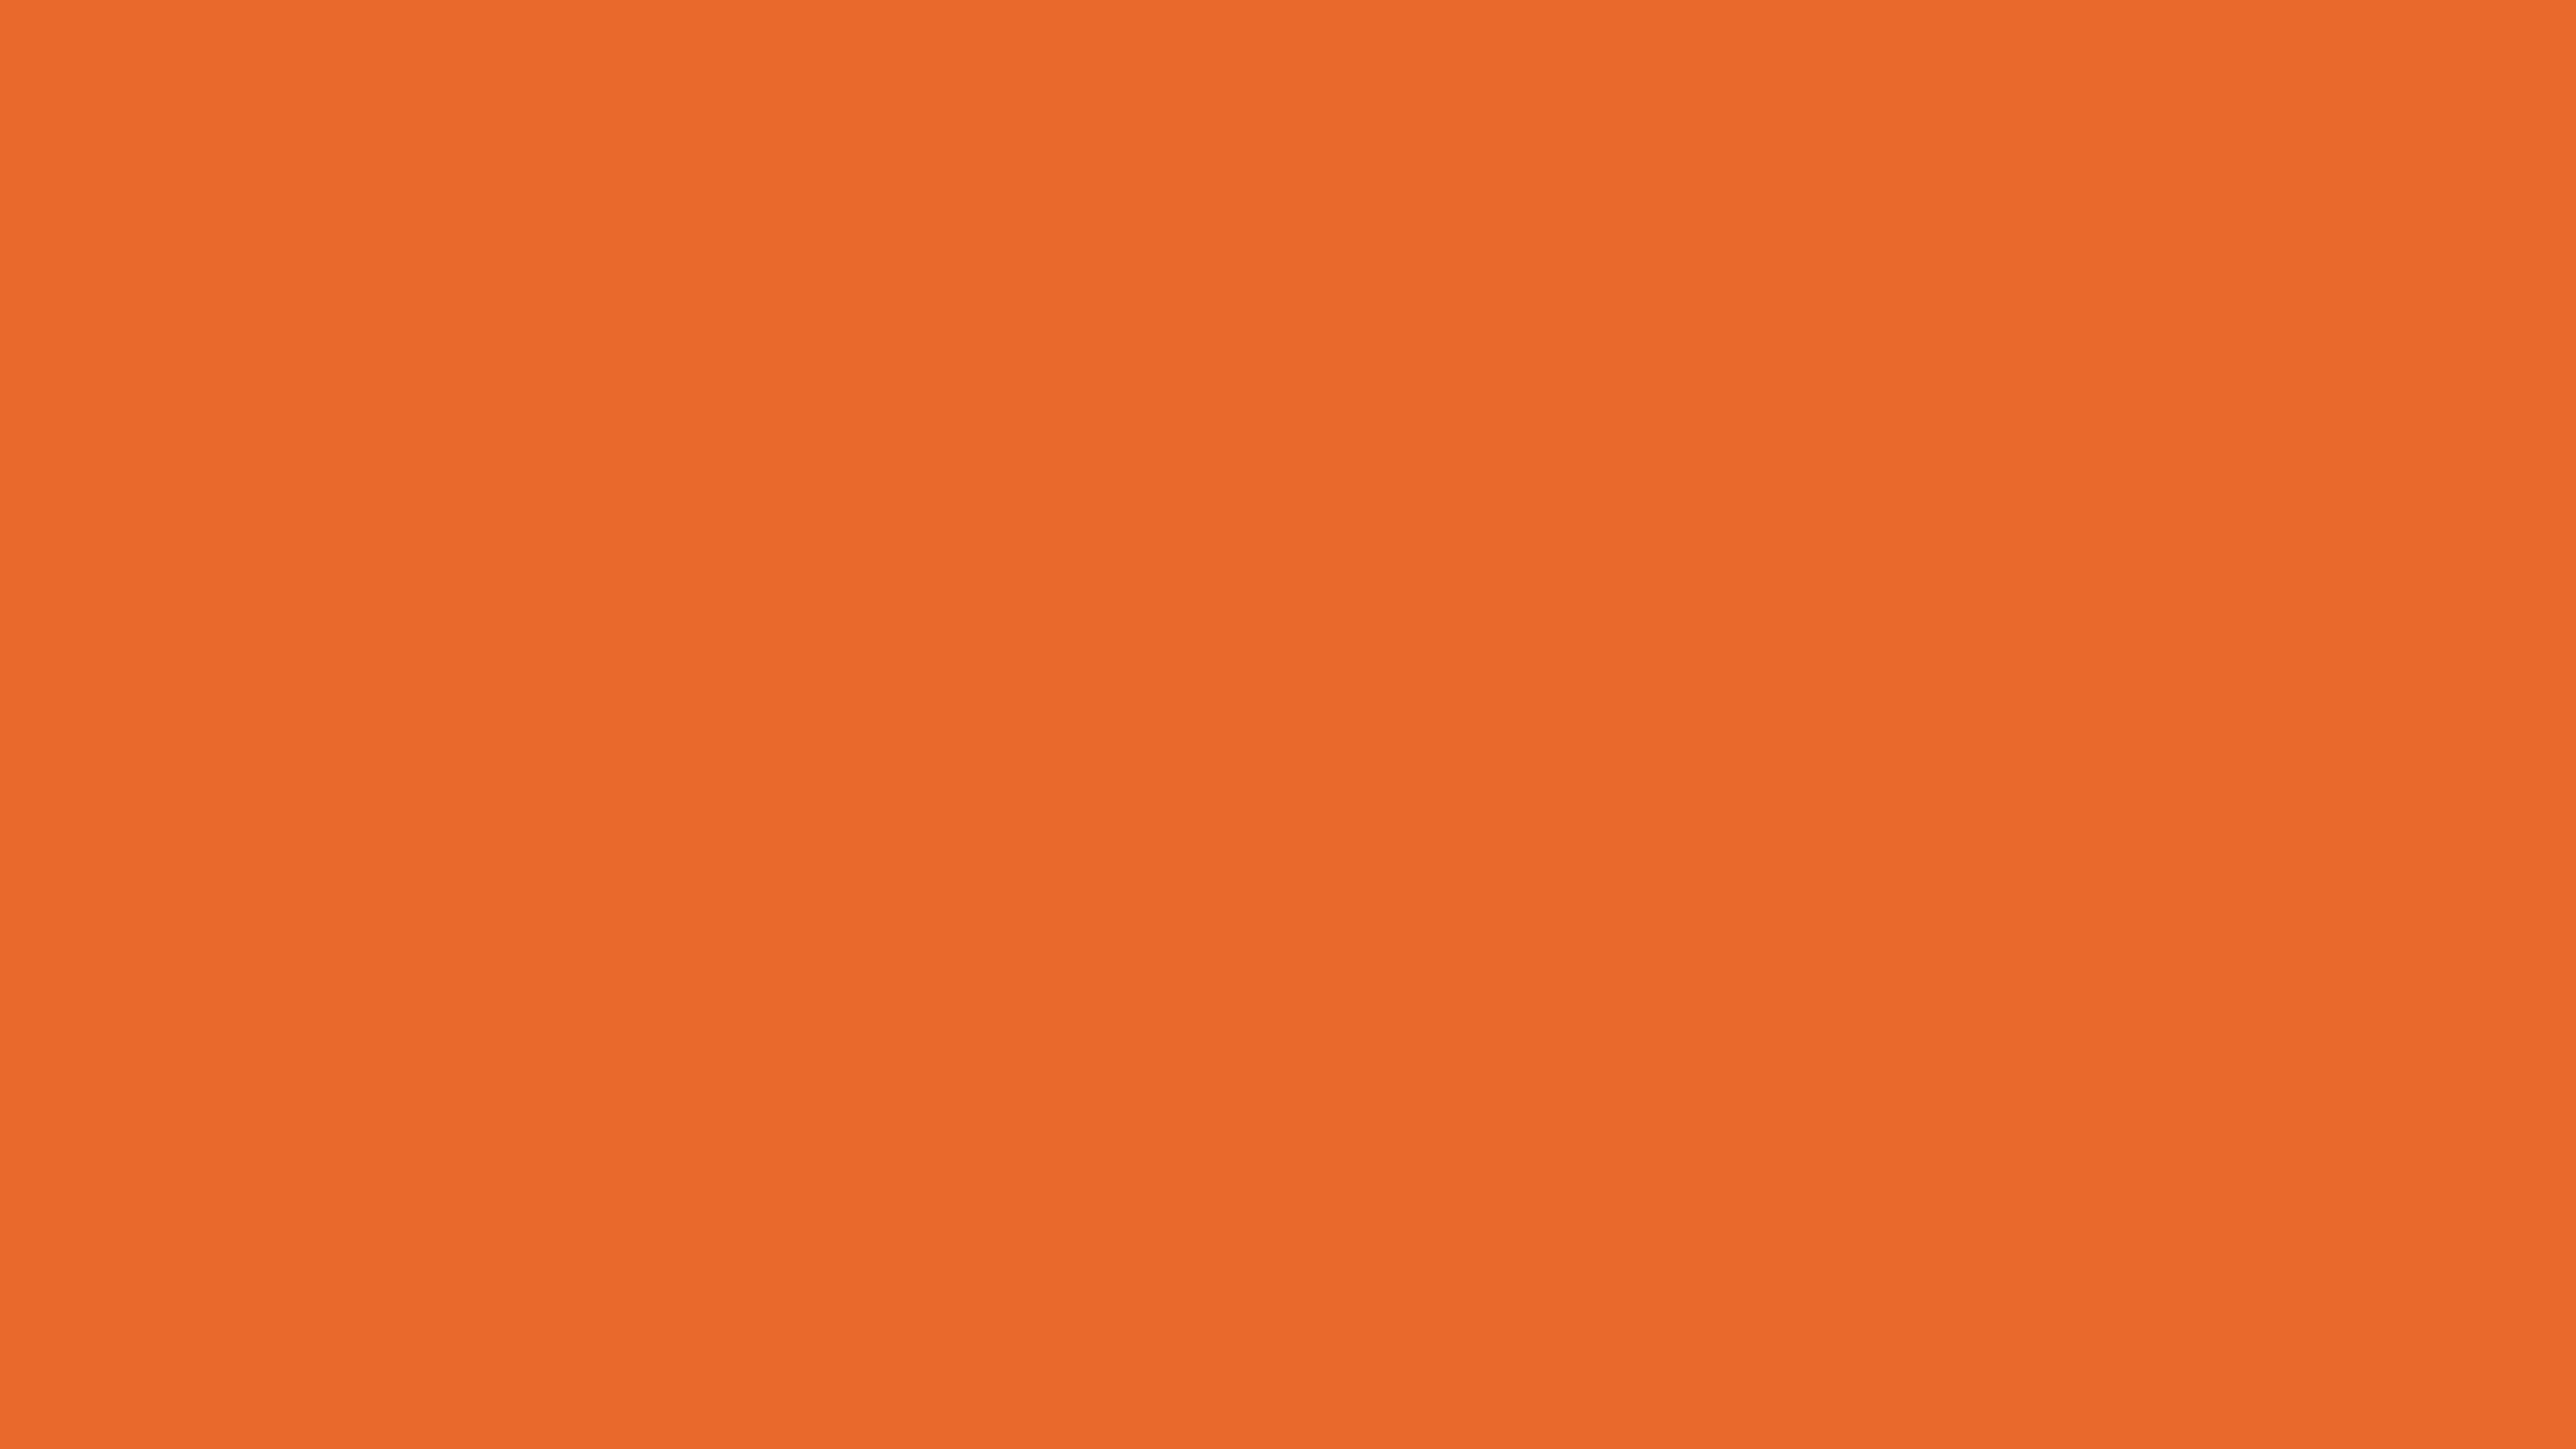 7680x4320 Deep Carrot Orange Solid Color Background